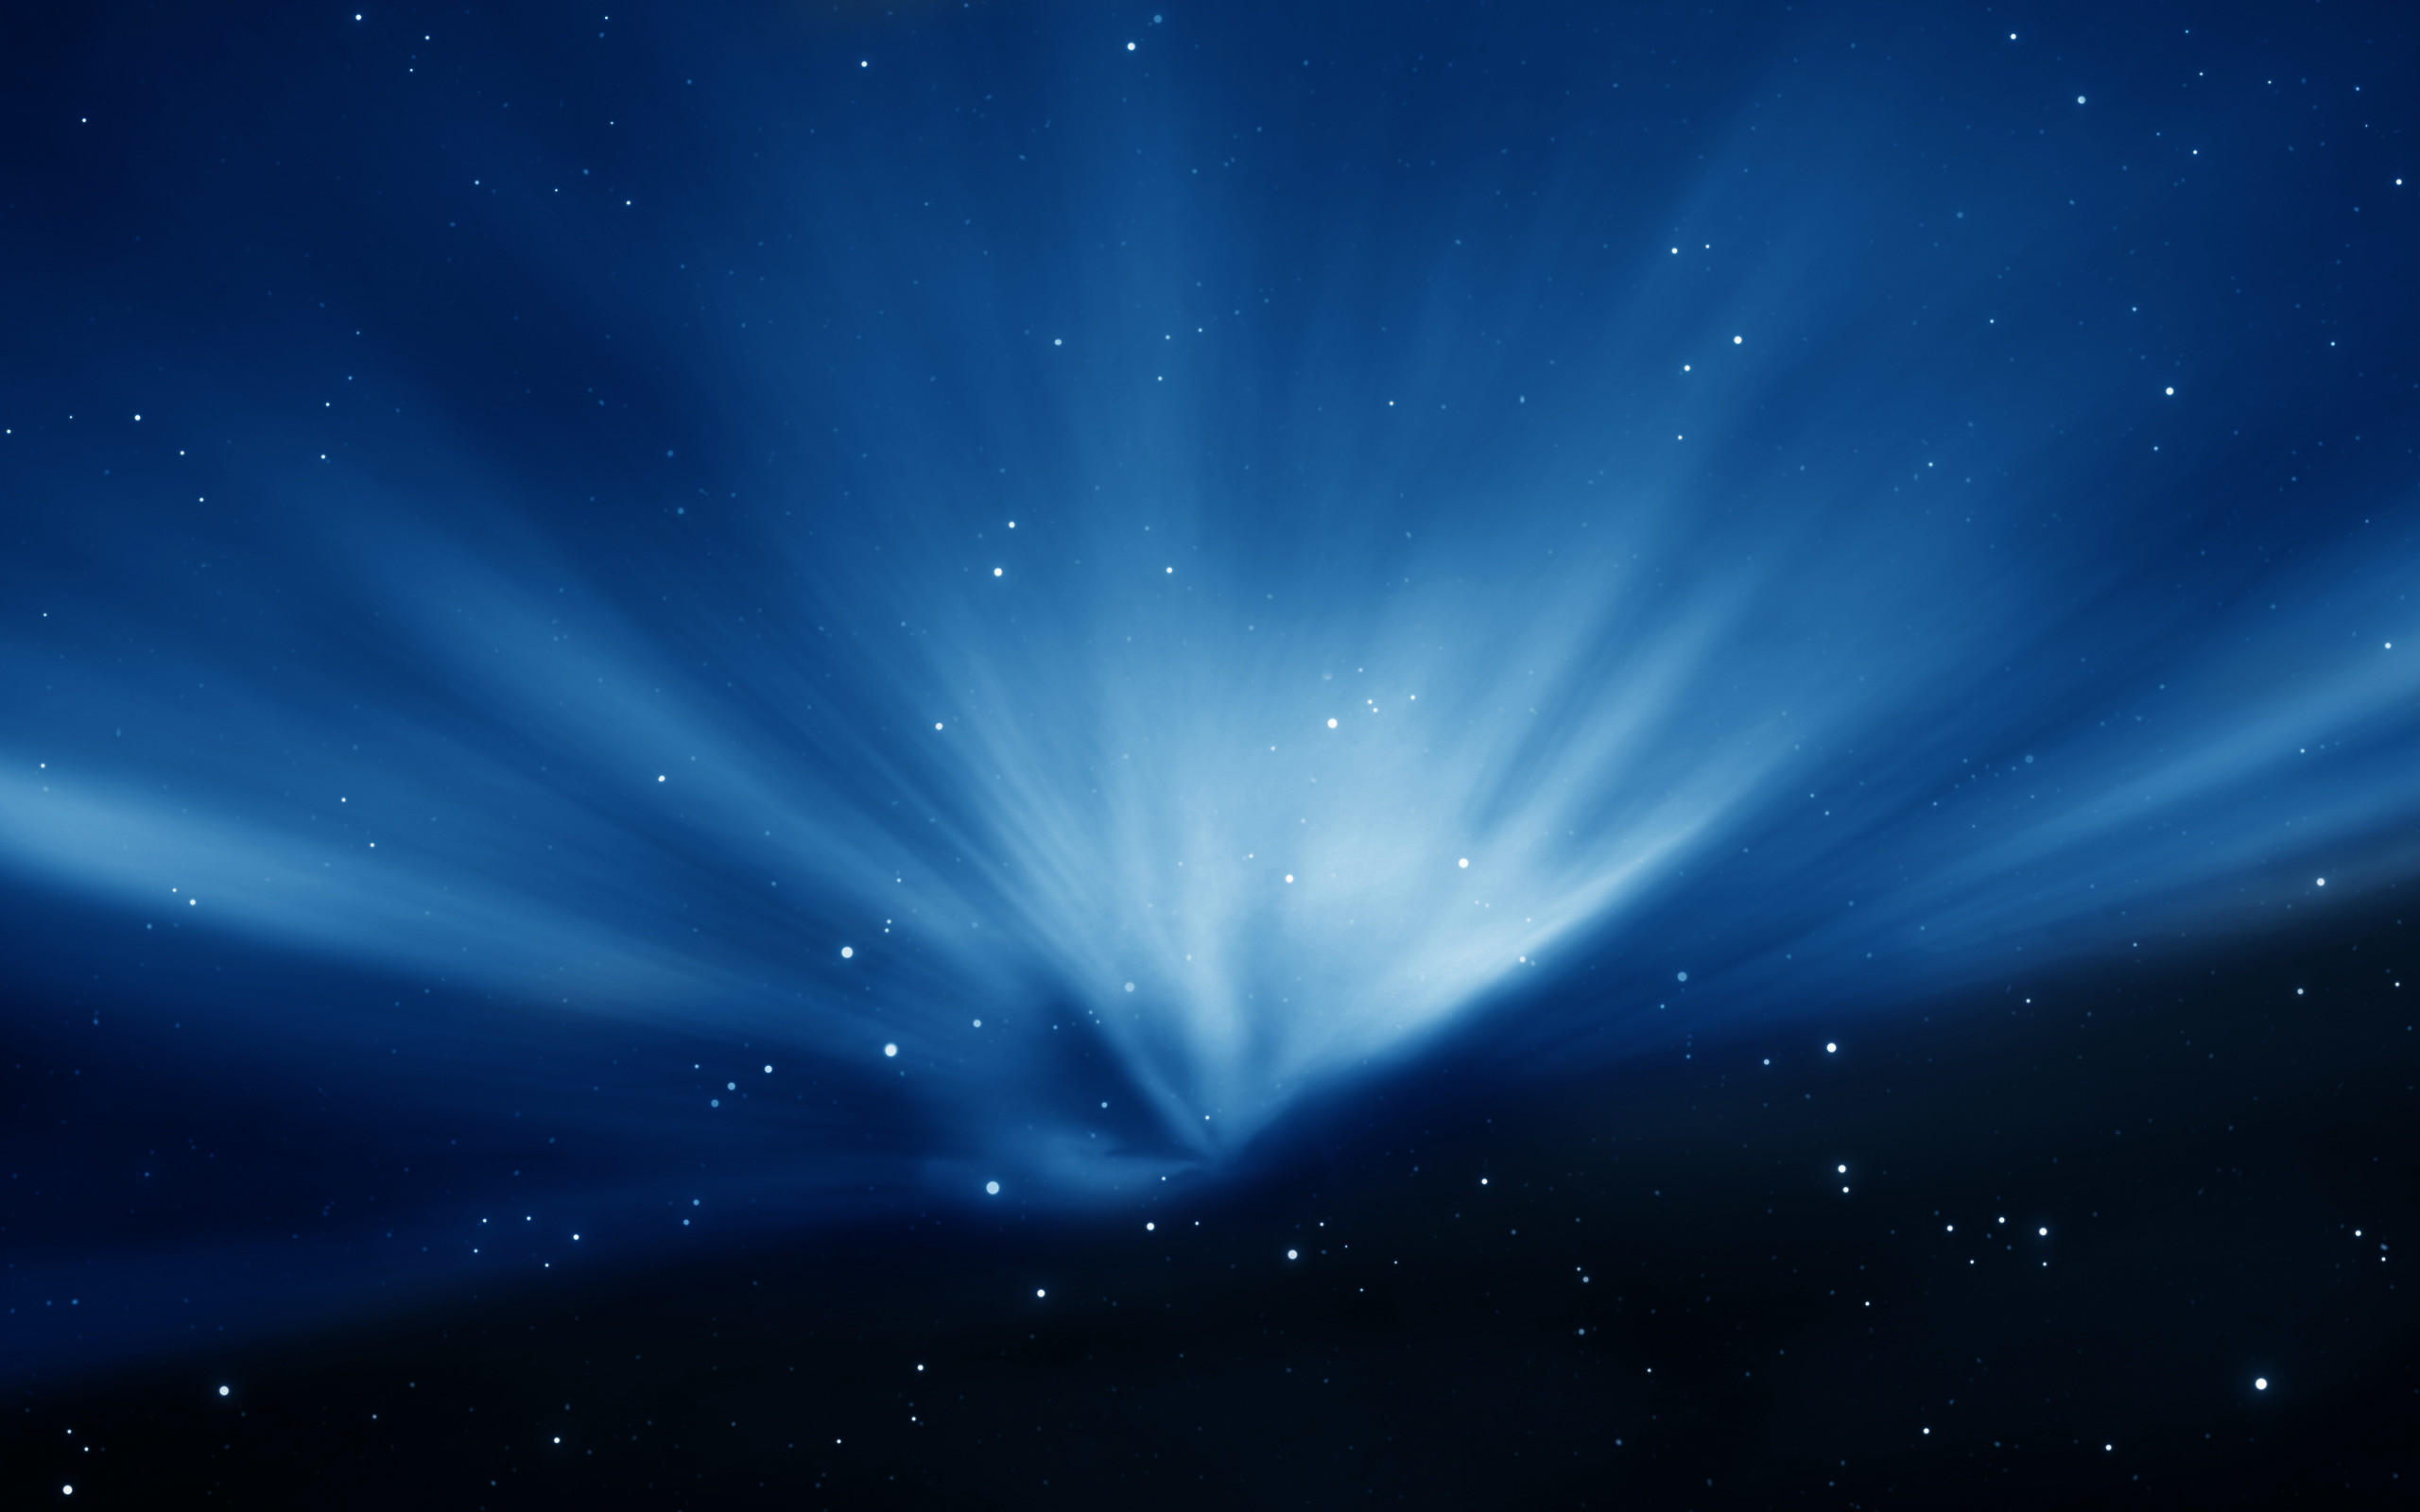 2560x1600 Wallpapers Apple Blue Galaxy Hd Large Snow Leopard Custom Aurora